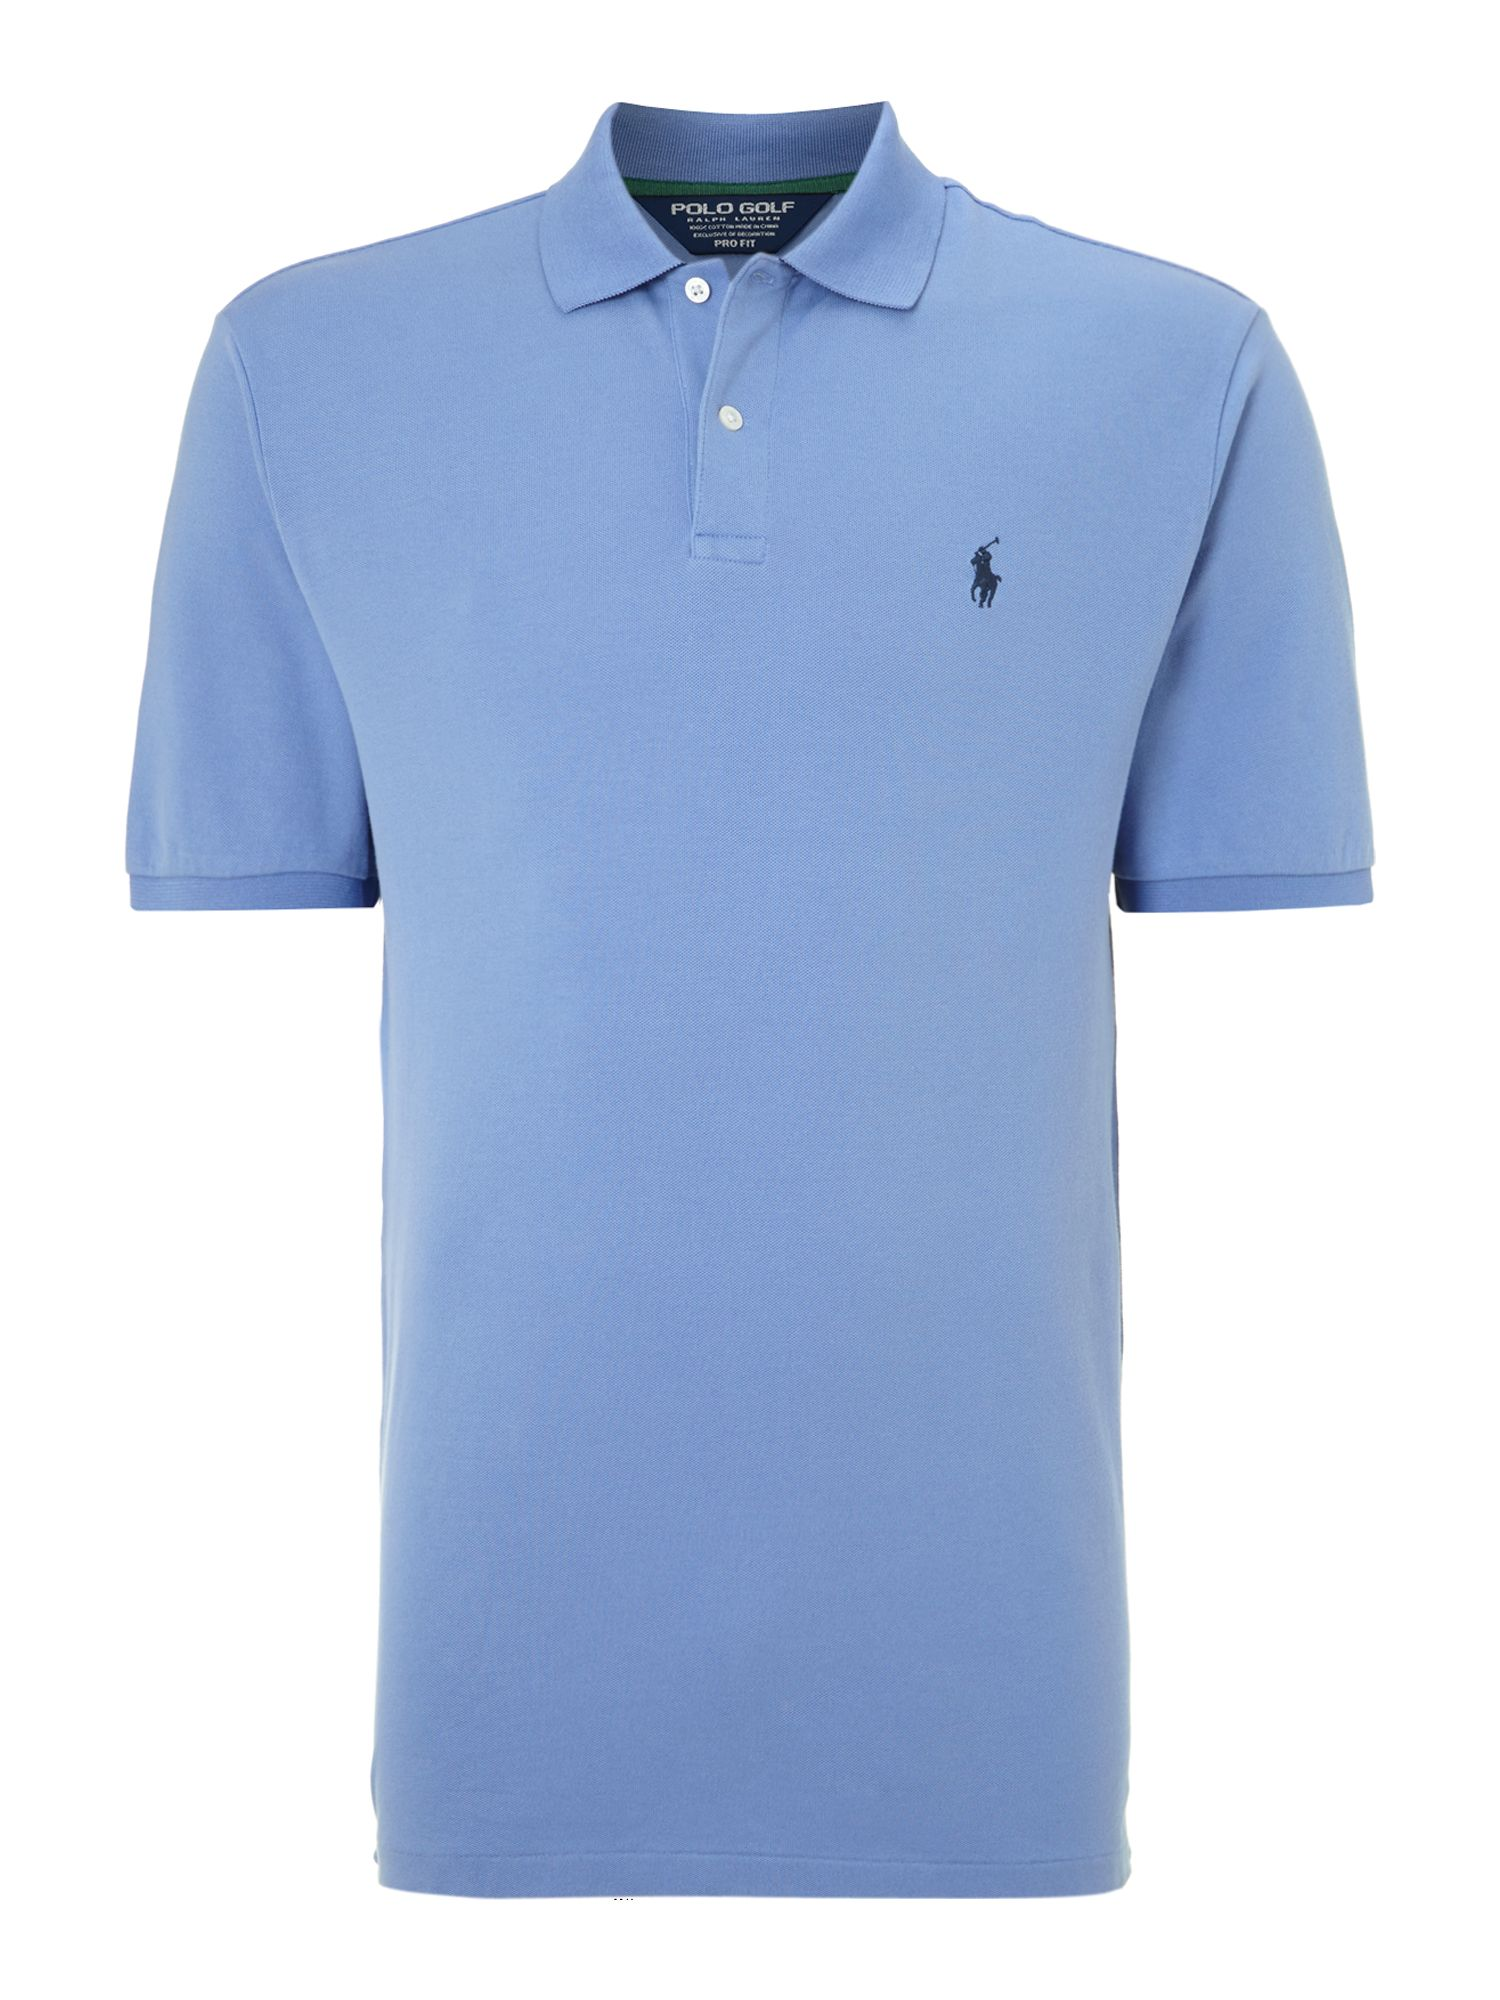 ralph lauren golf contrast collar polo shirt in blue for. Black Bedroom Furniture Sets. Home Design Ideas